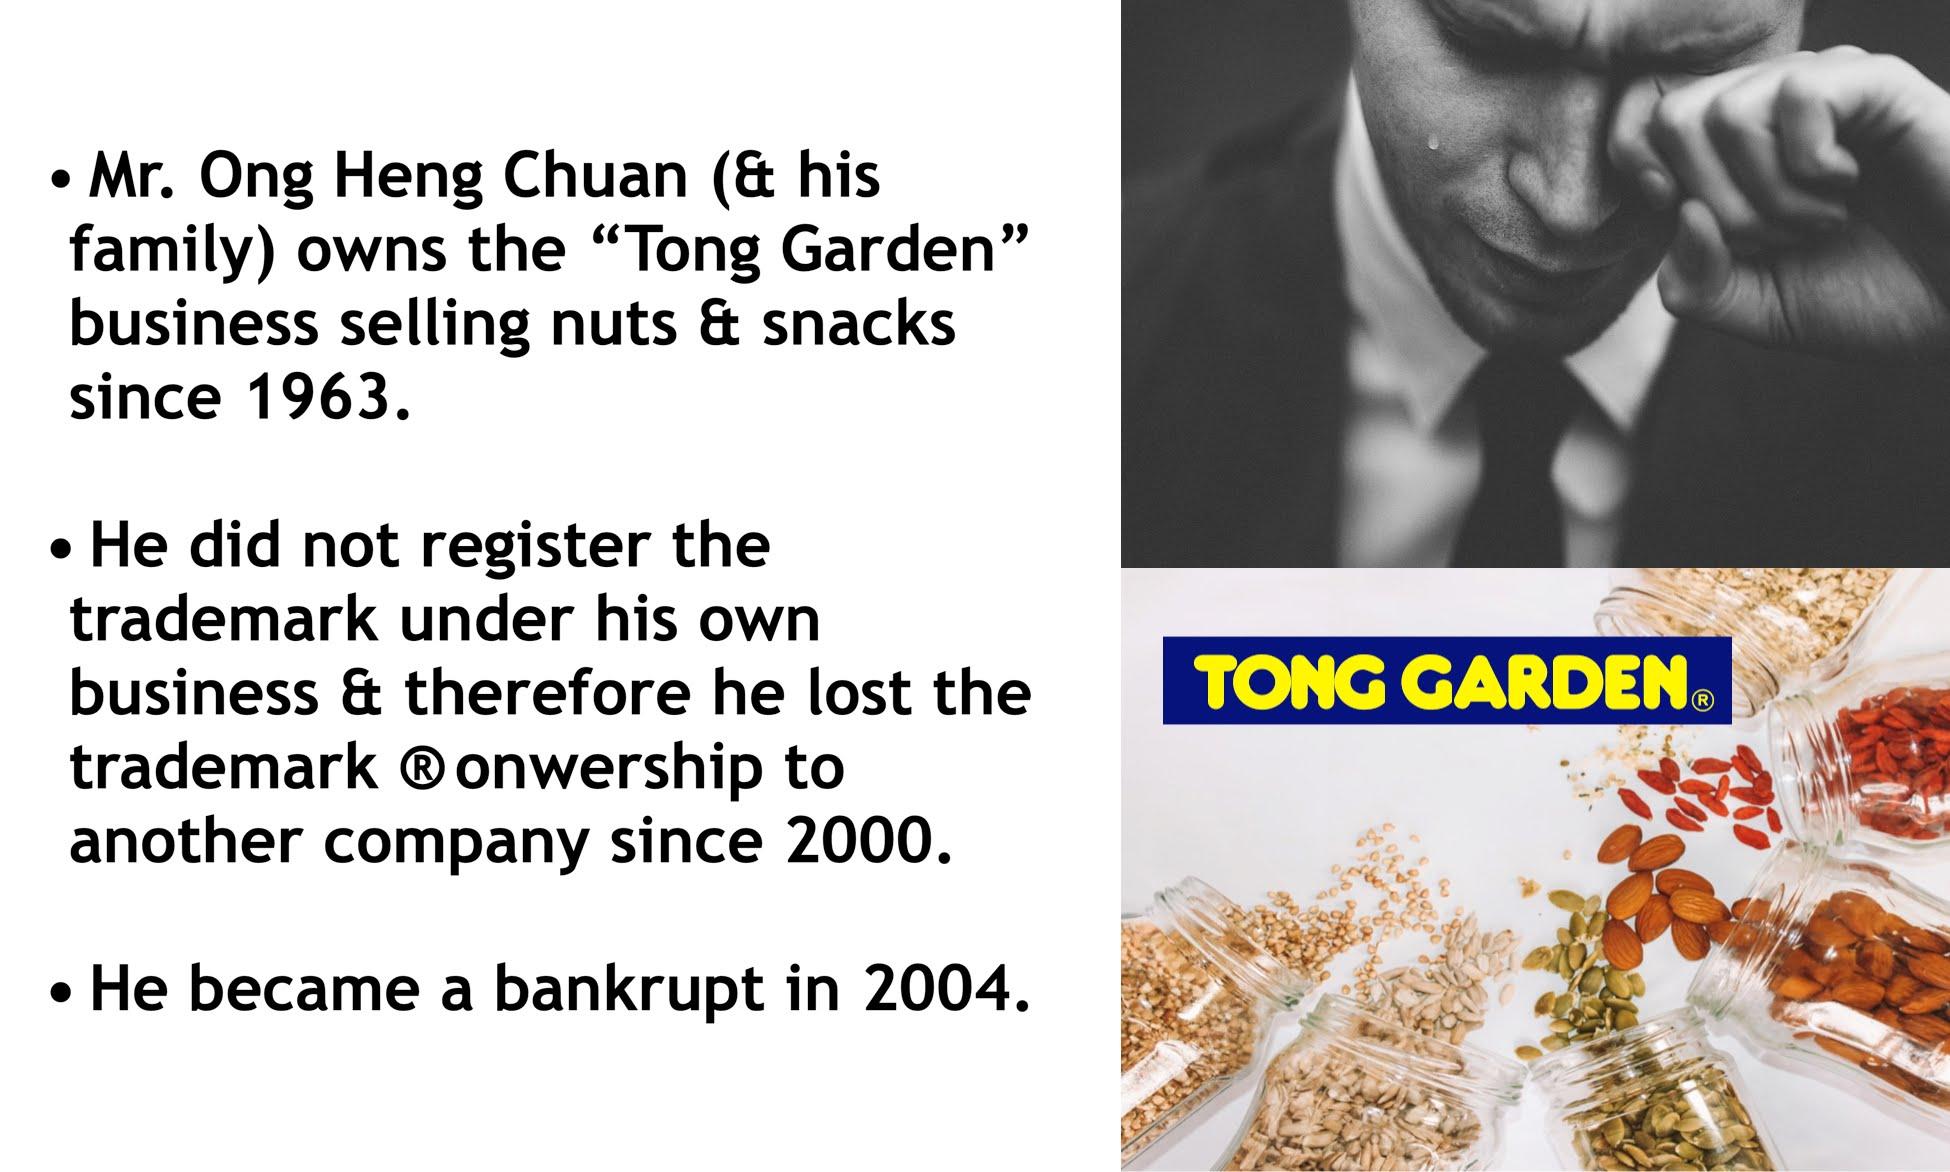 Tong Garden Owner Loses Trademark & Bankrupt